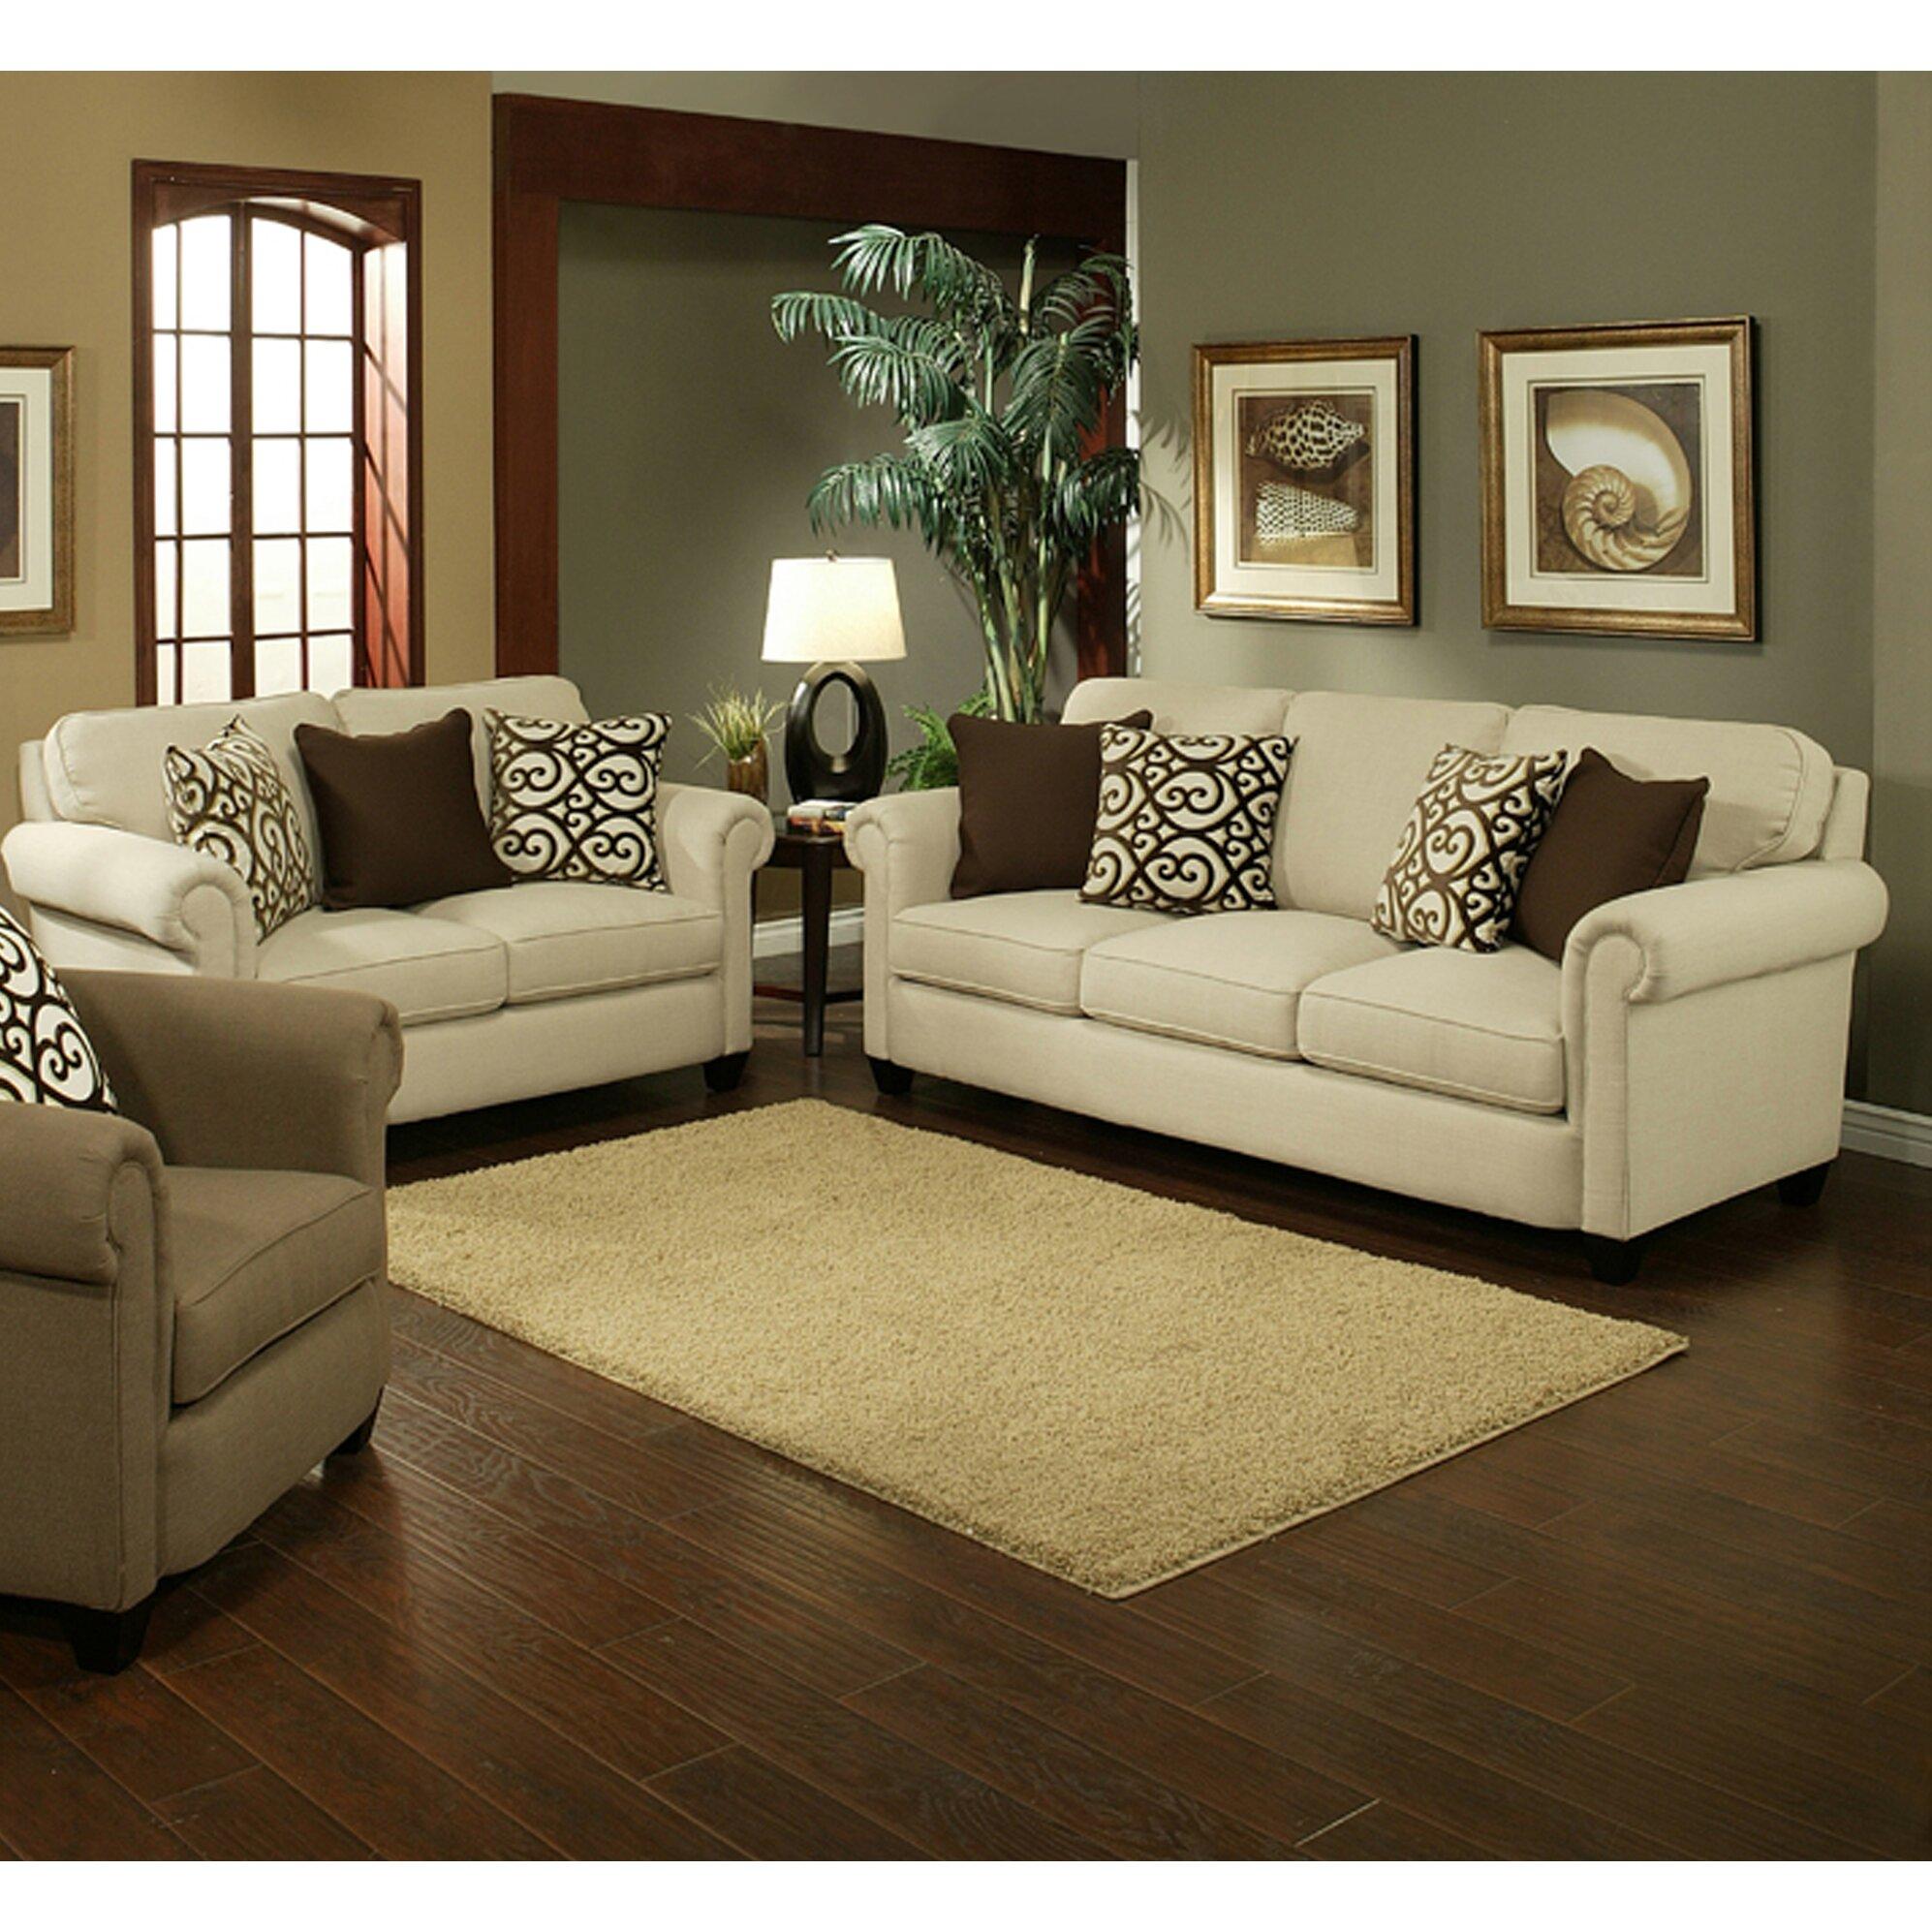 Hokku Designs Riame Sofa Reviews Wayfair